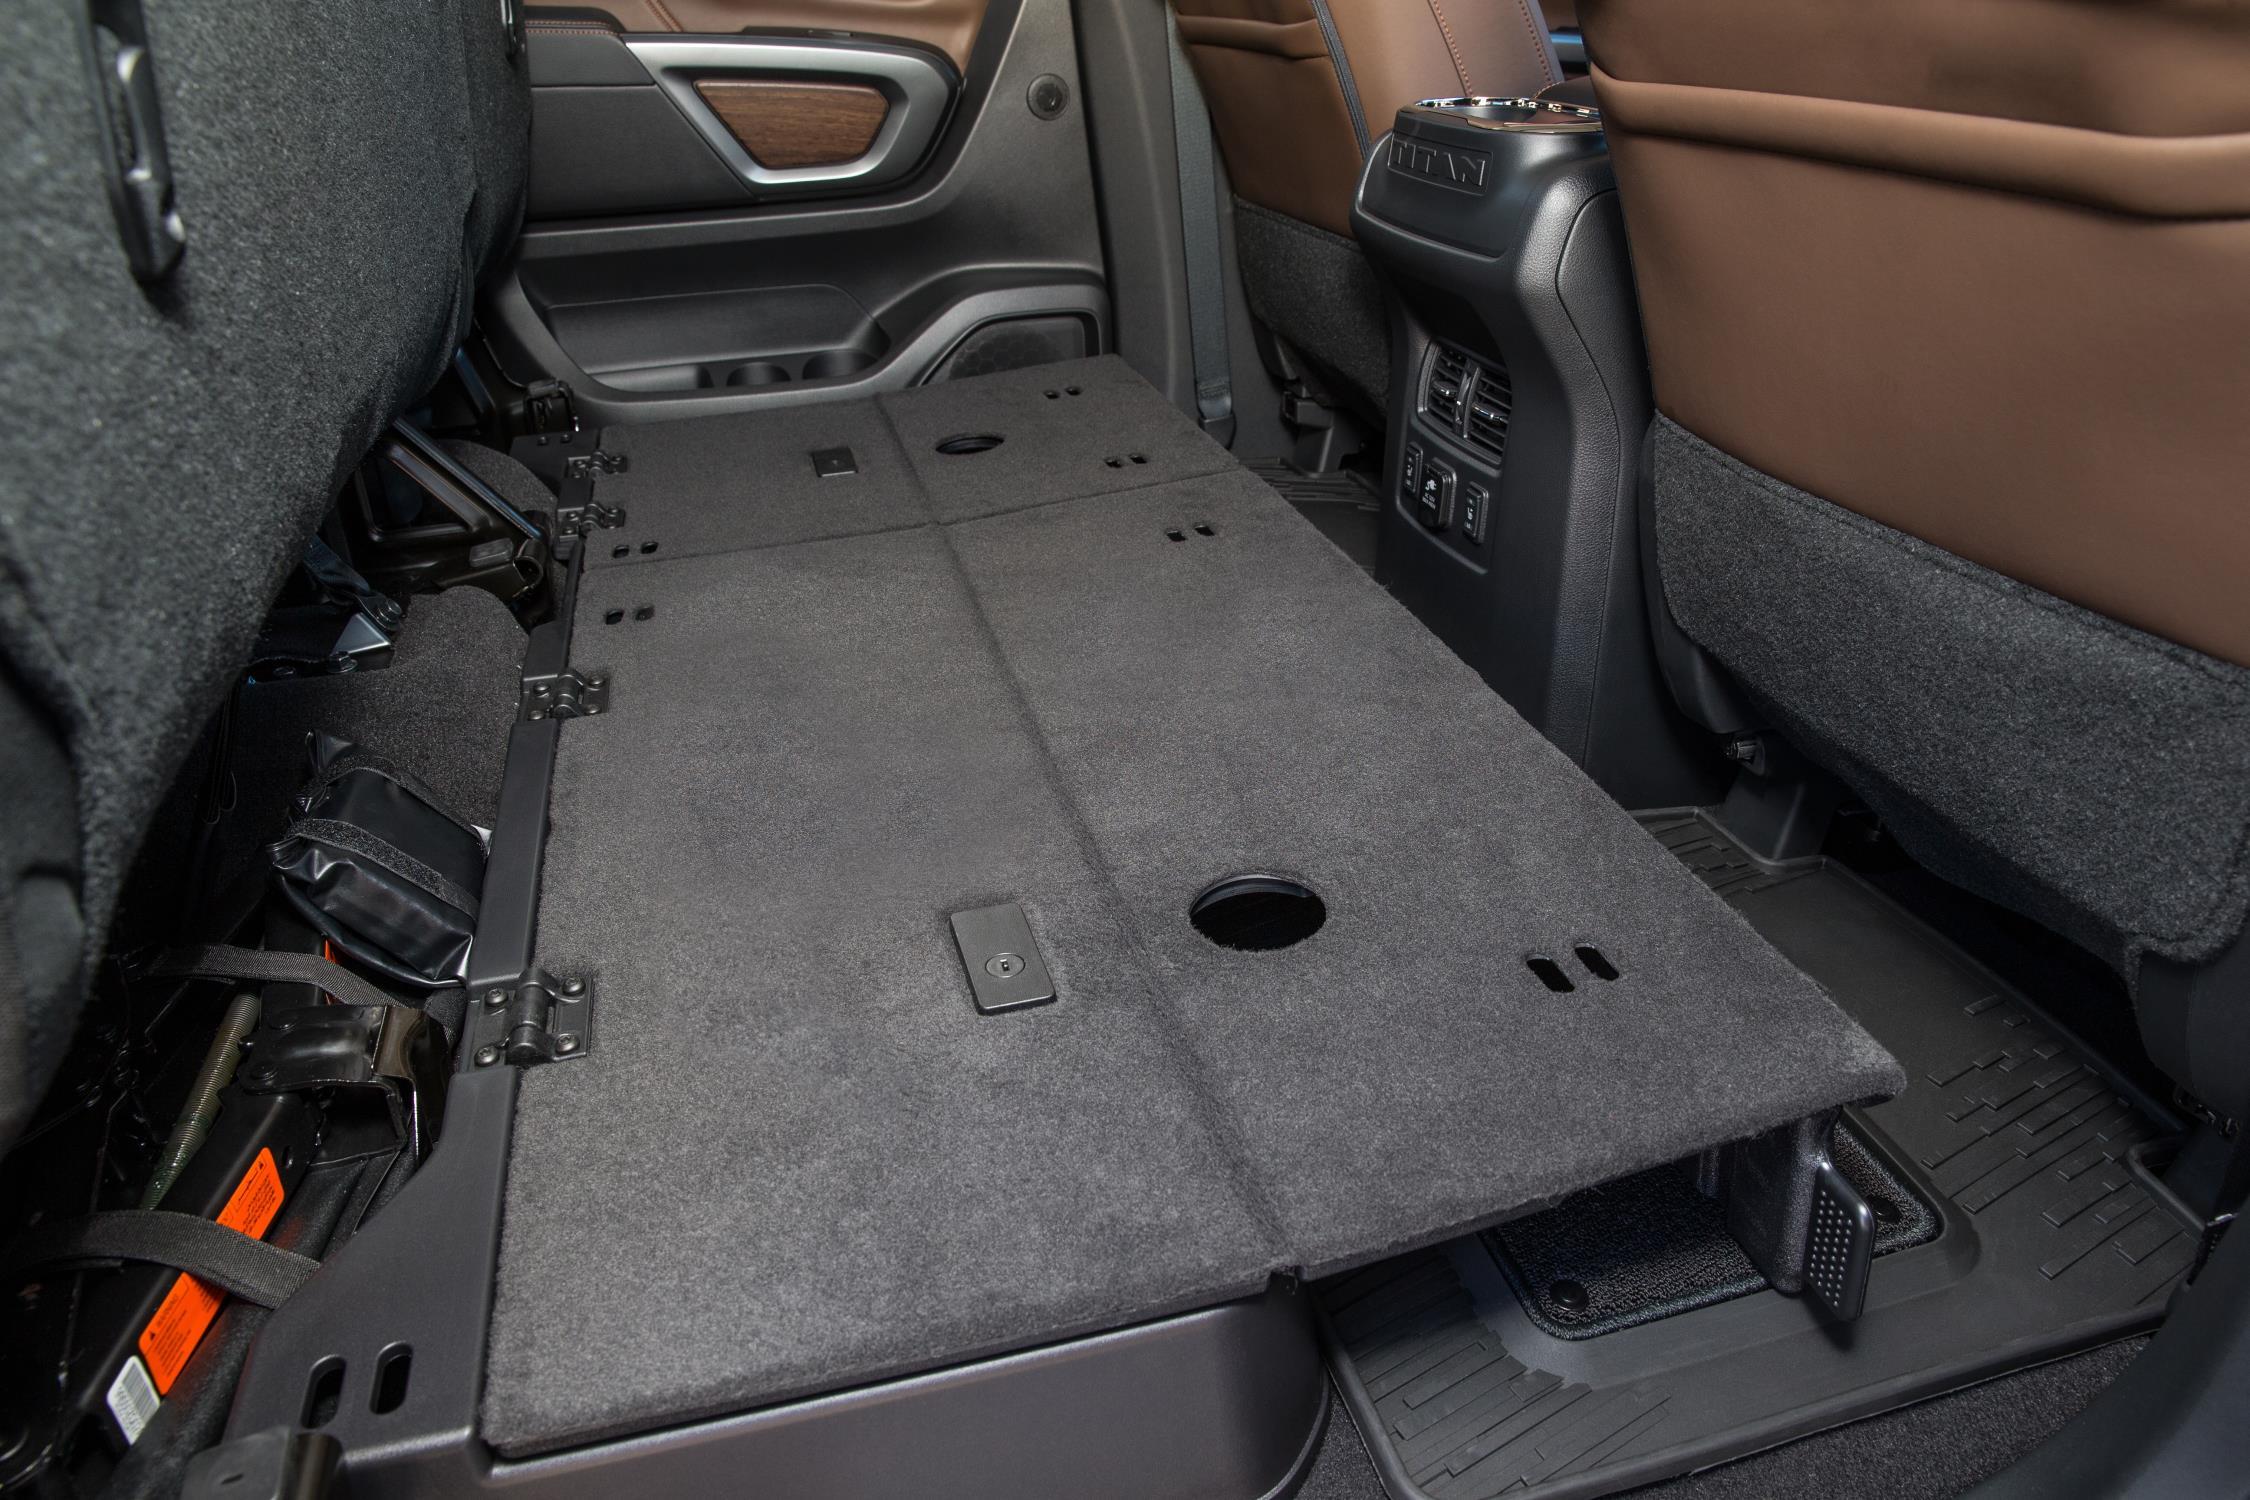 Fantastic 2016 Nissan Titan XD 56 V8 Price Announced 2017 Nissan